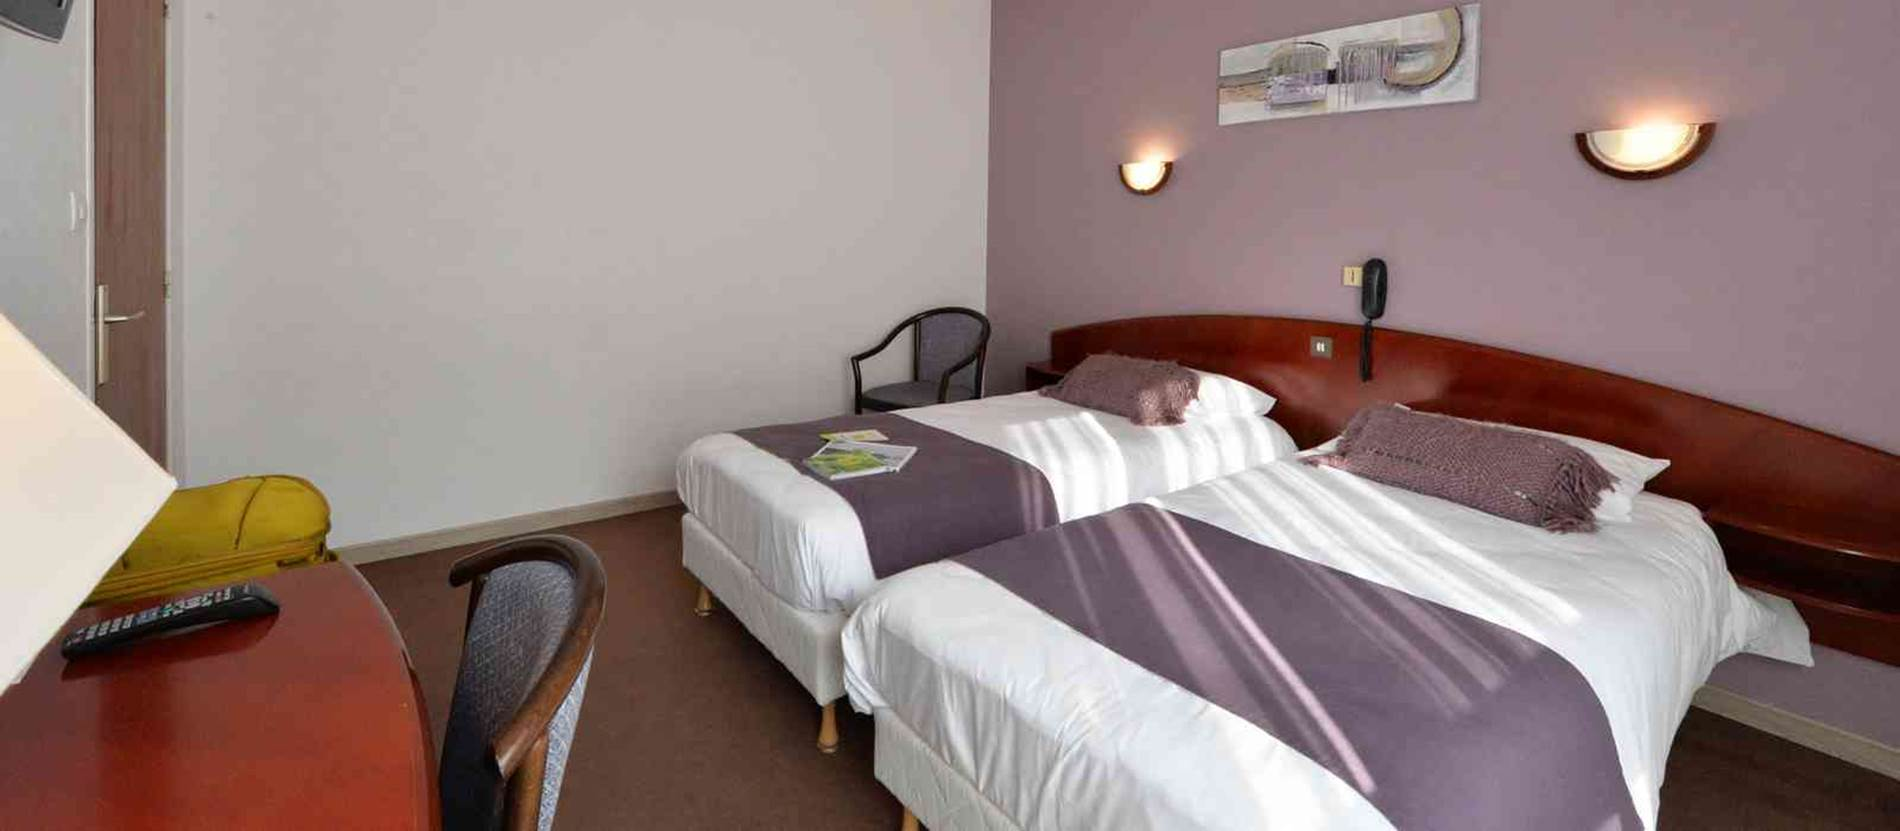 hotel-logis-letylann-saintave-morbihan-bretagne-sud © hotel-logis-letylann-saintave-morbihan